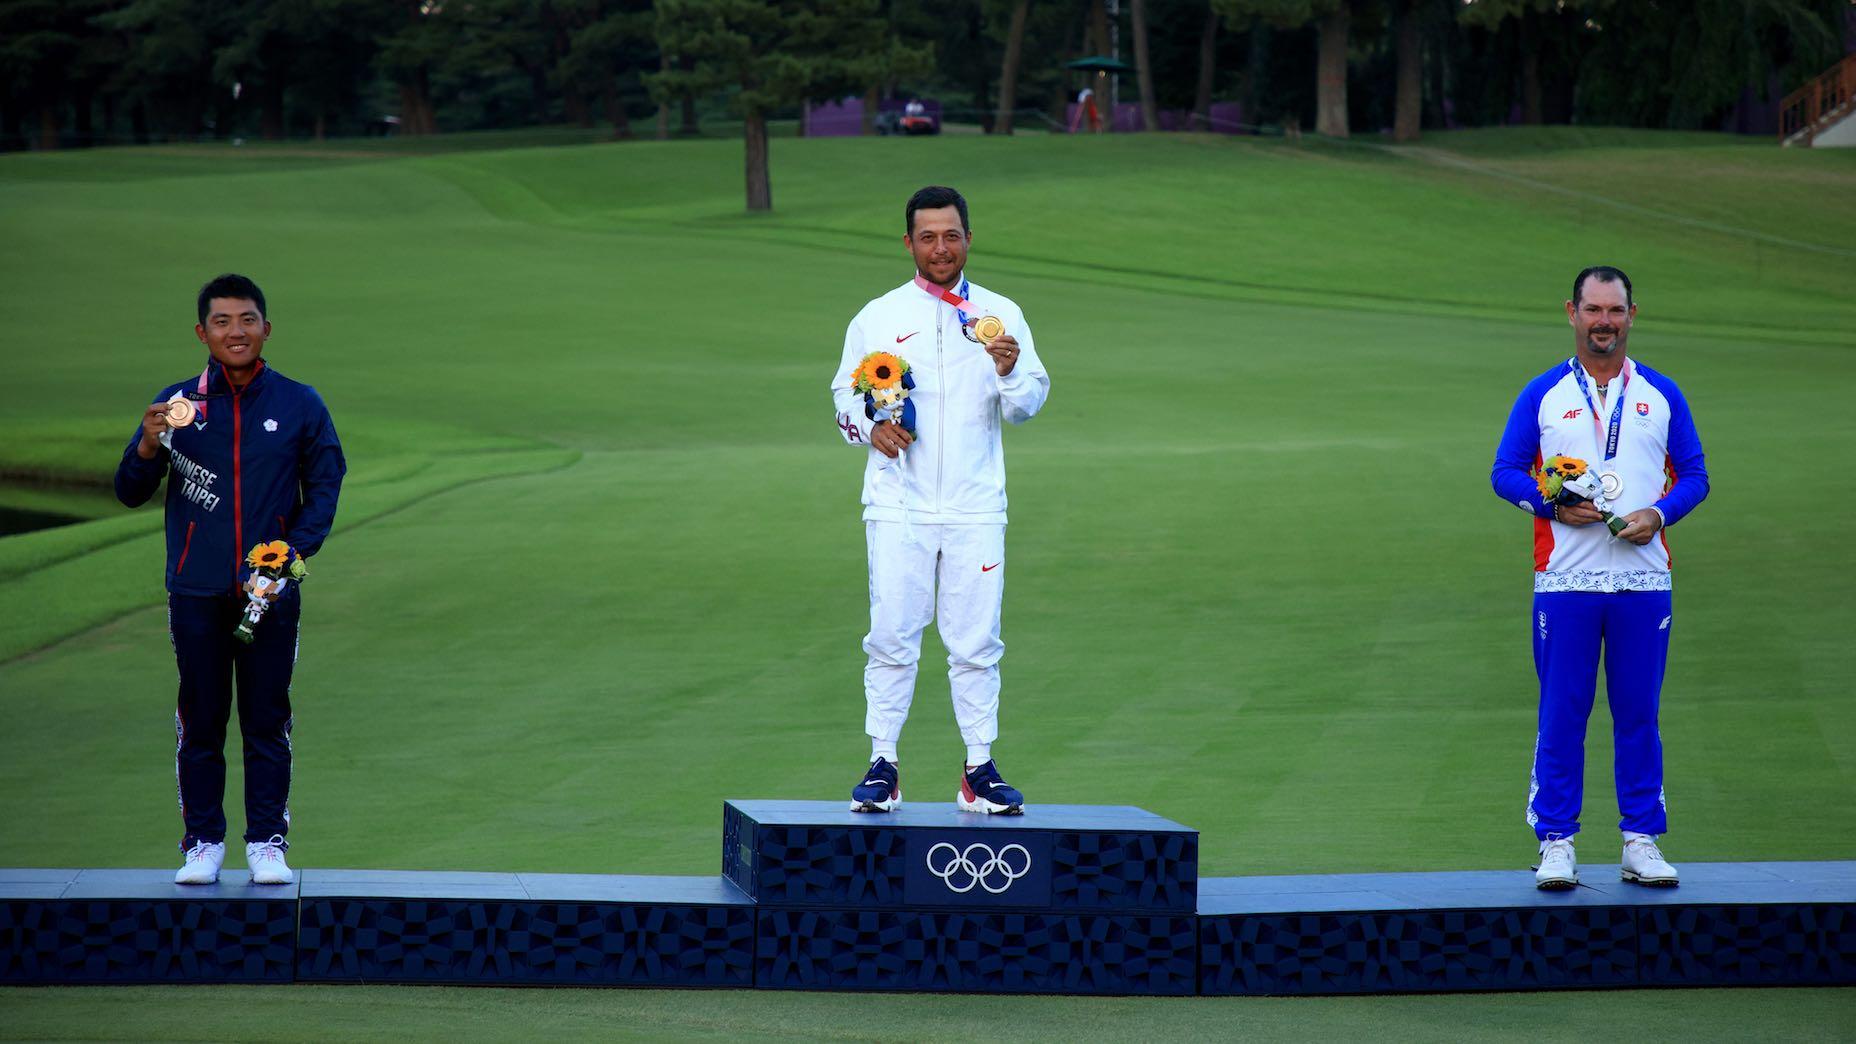 golfers on podium